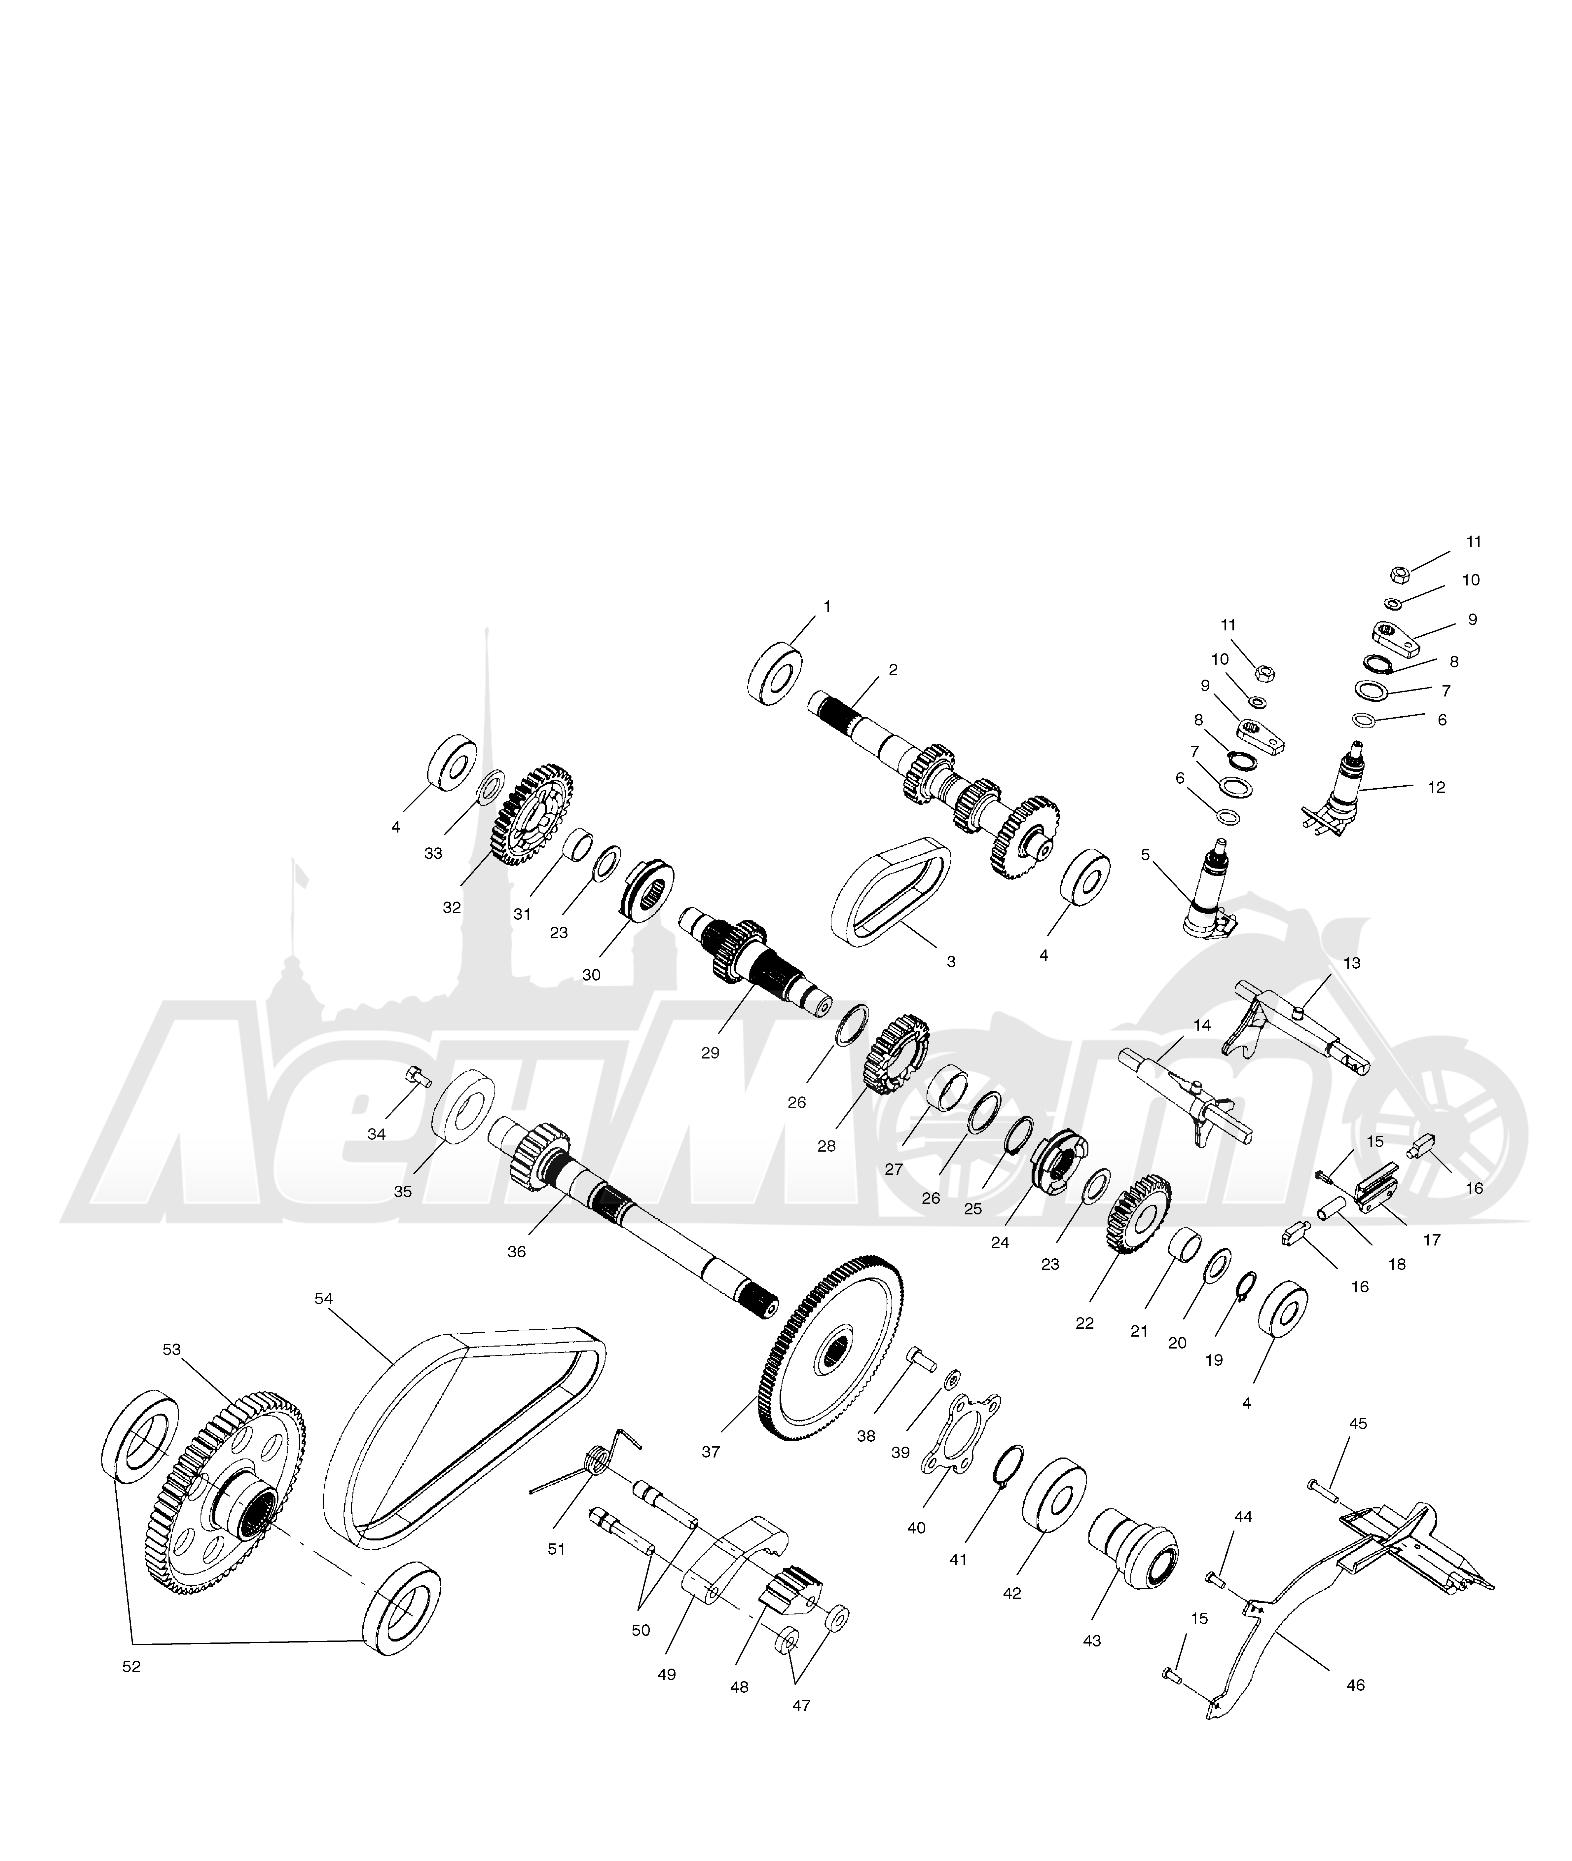 Запчасти для Квадроцикла Polaris 1997 SPORTSMAN 500 - W97CH50A Раздел: GEARCASE (INTERNAL COMPONENTS) - W97CH50A | коробка передач (INTERNAL компоненты) W97CH50A